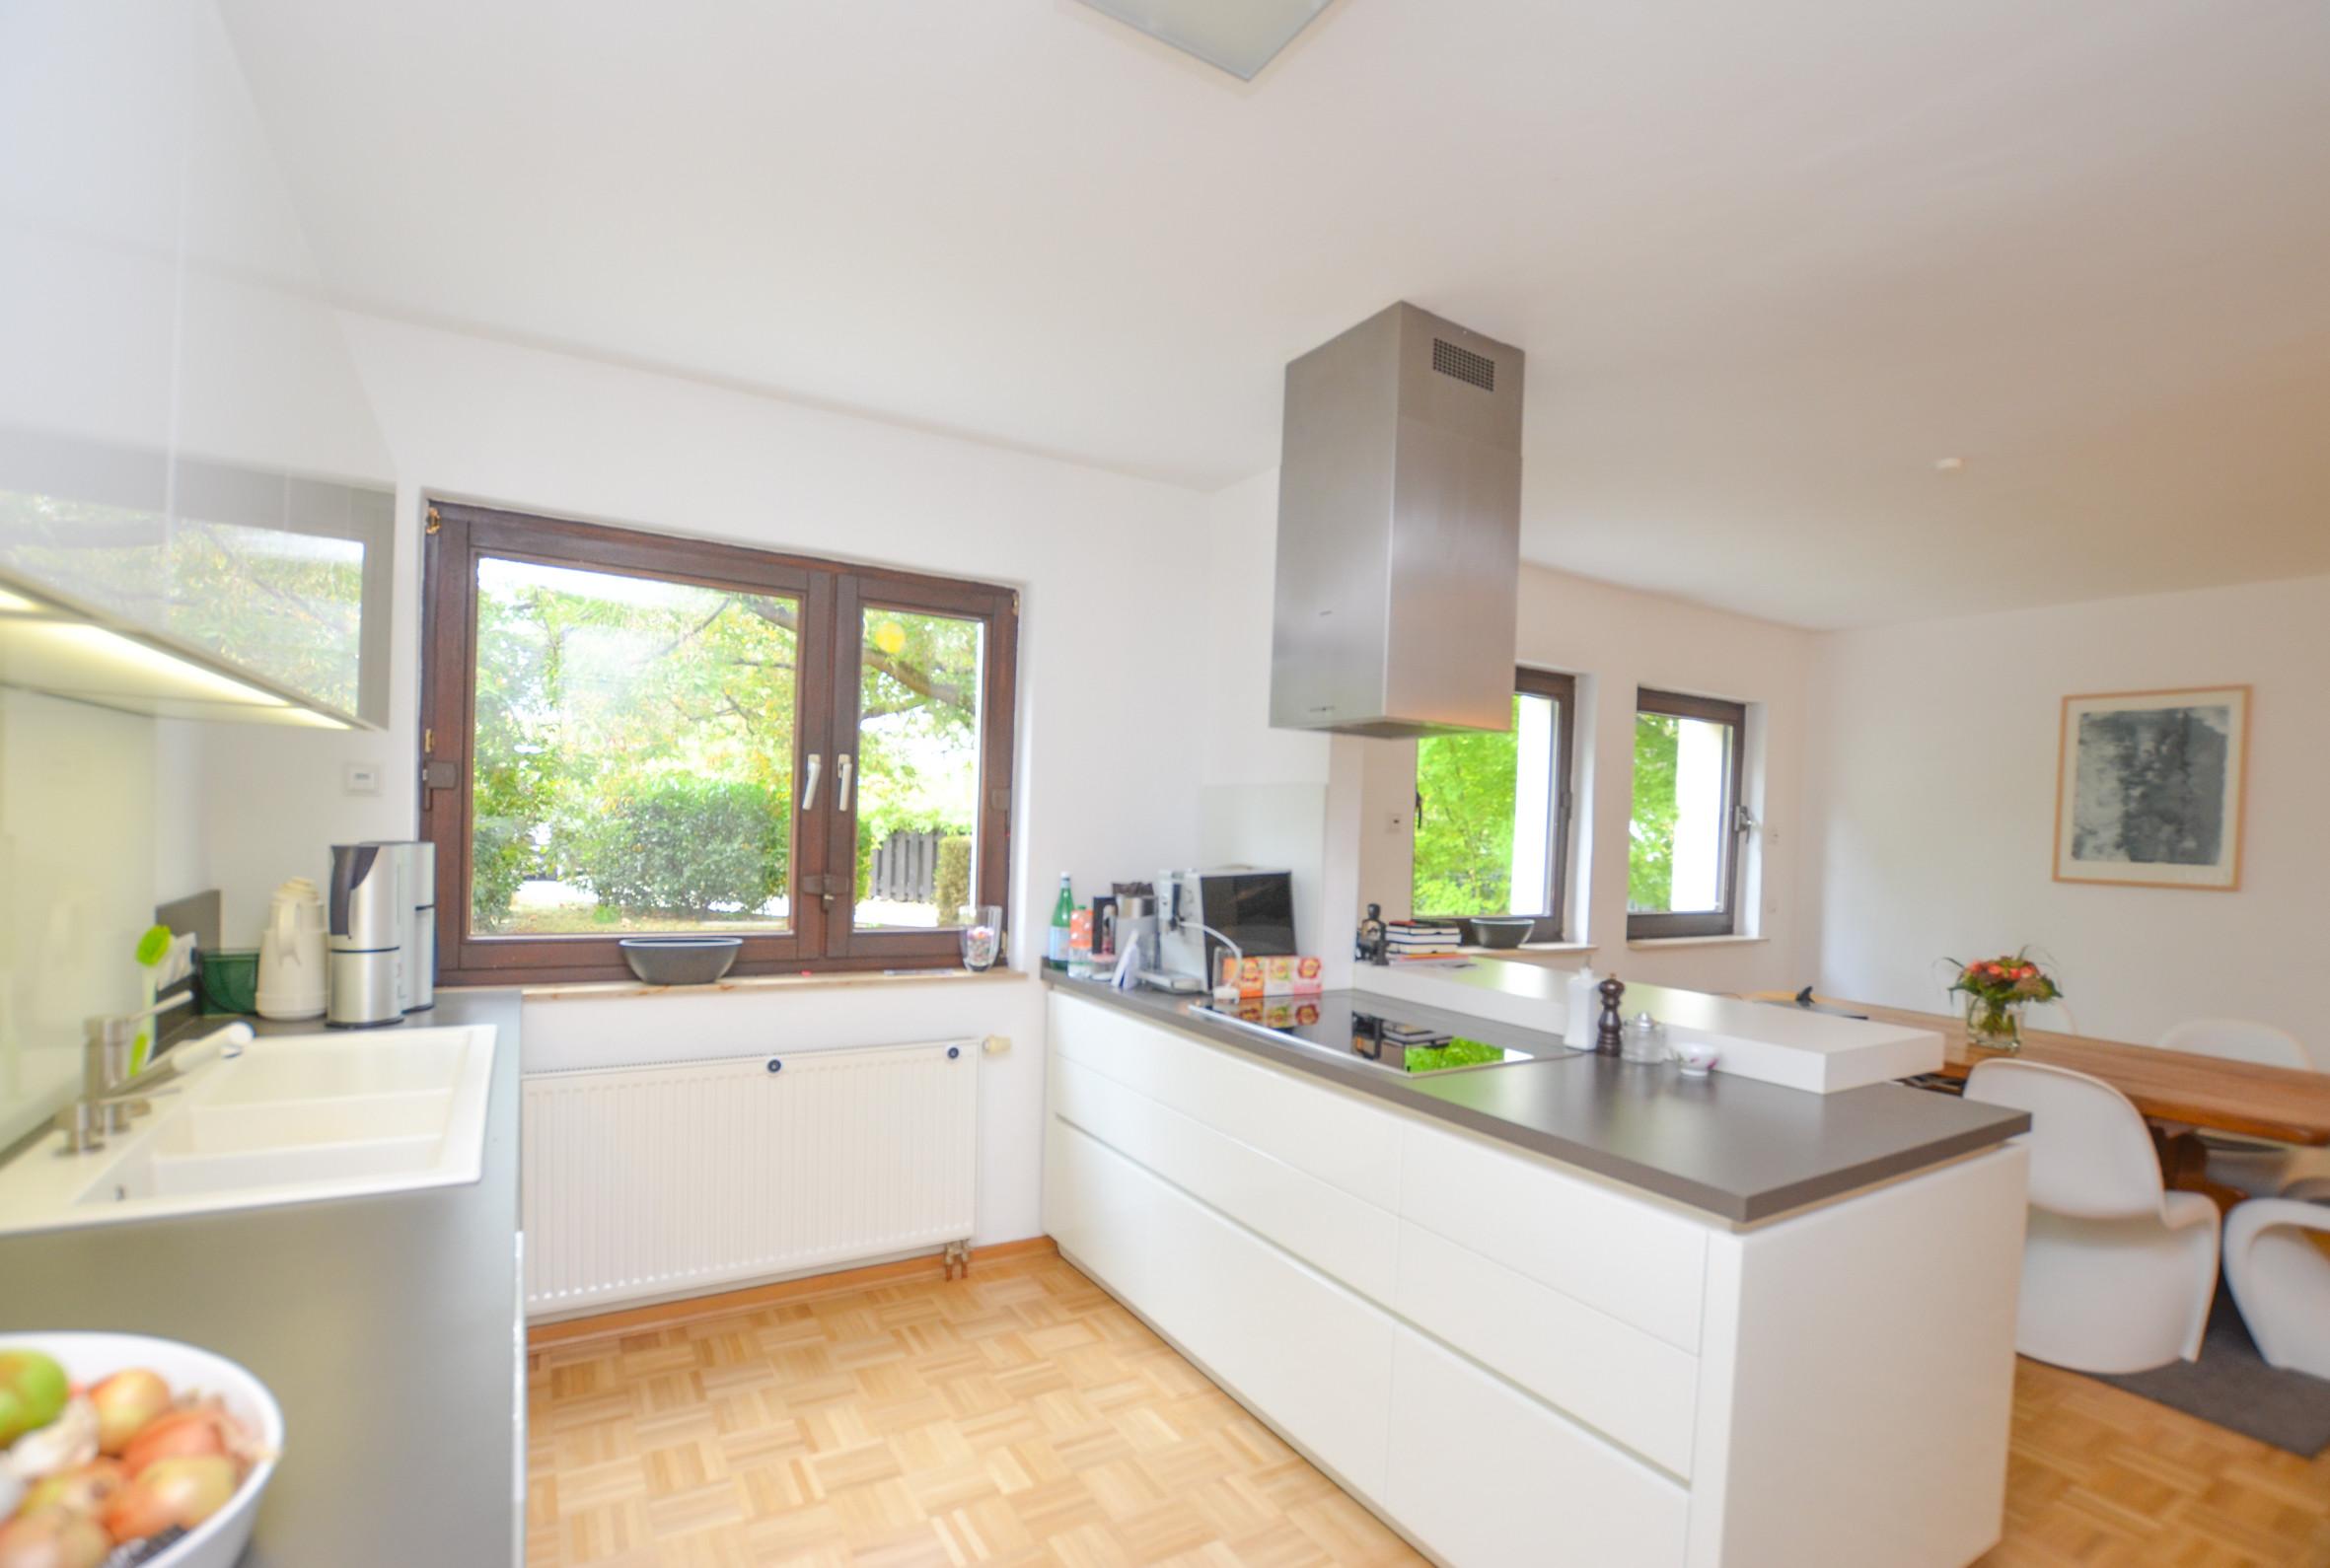 Haus Kaufen Bonn  Haus kaufen Bonn